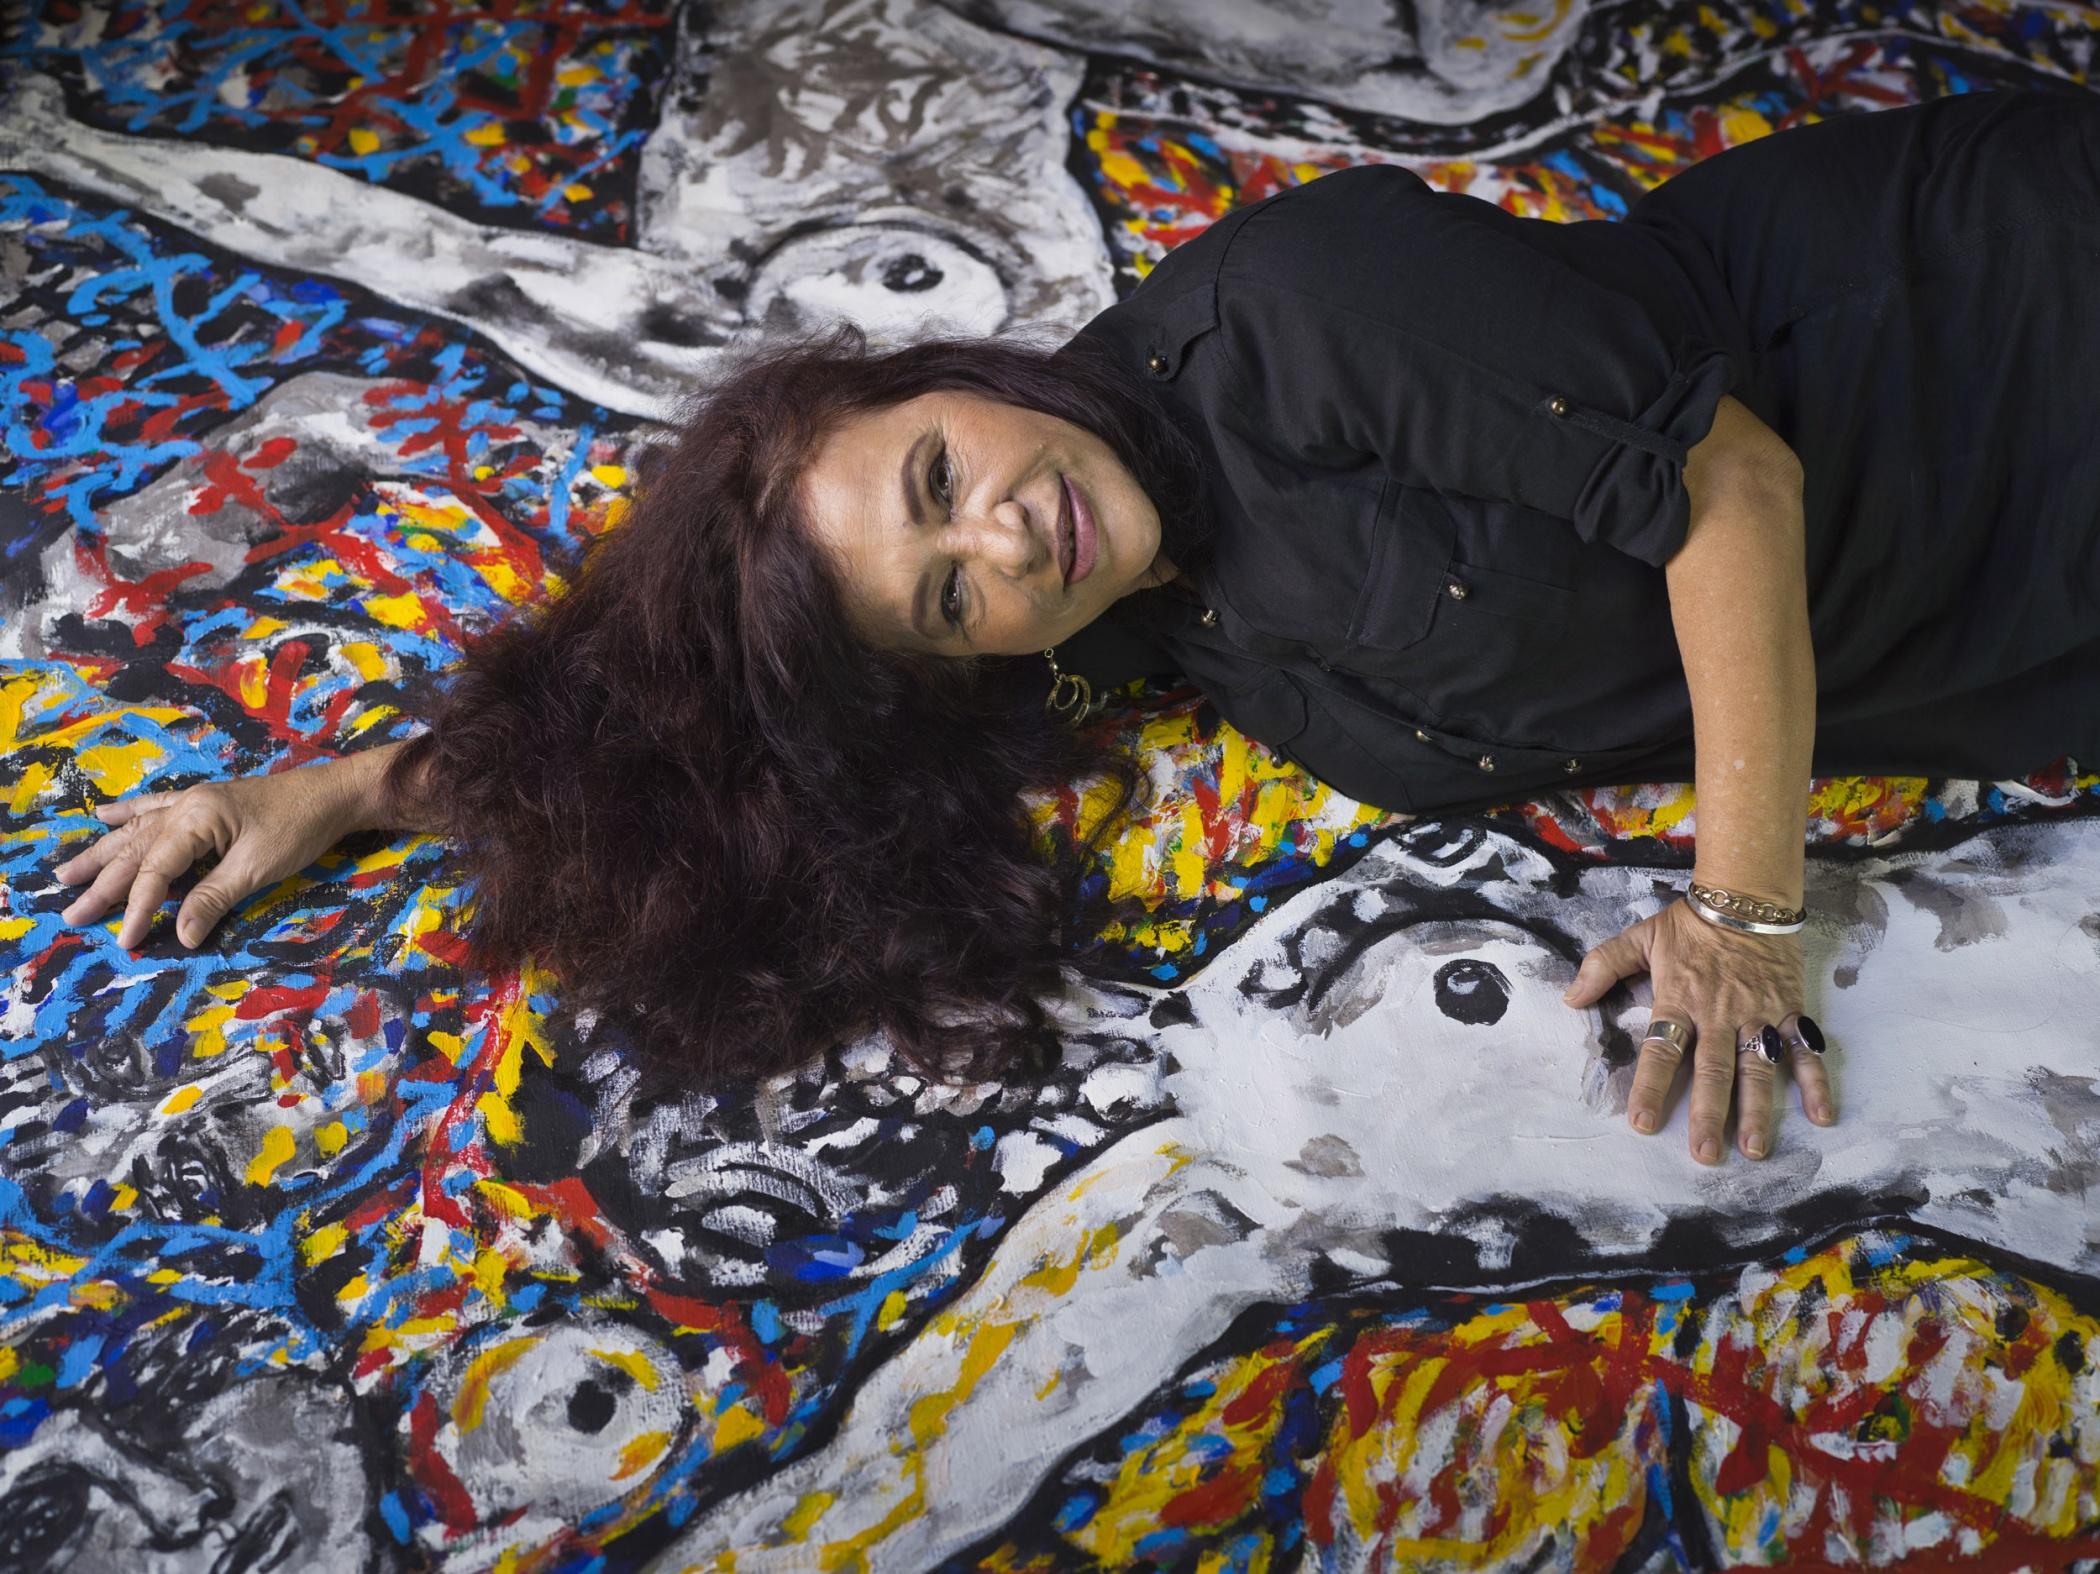 Zaida del Río, painter - Illuminated Cuba - Hector Garrido, Aerial and human photography